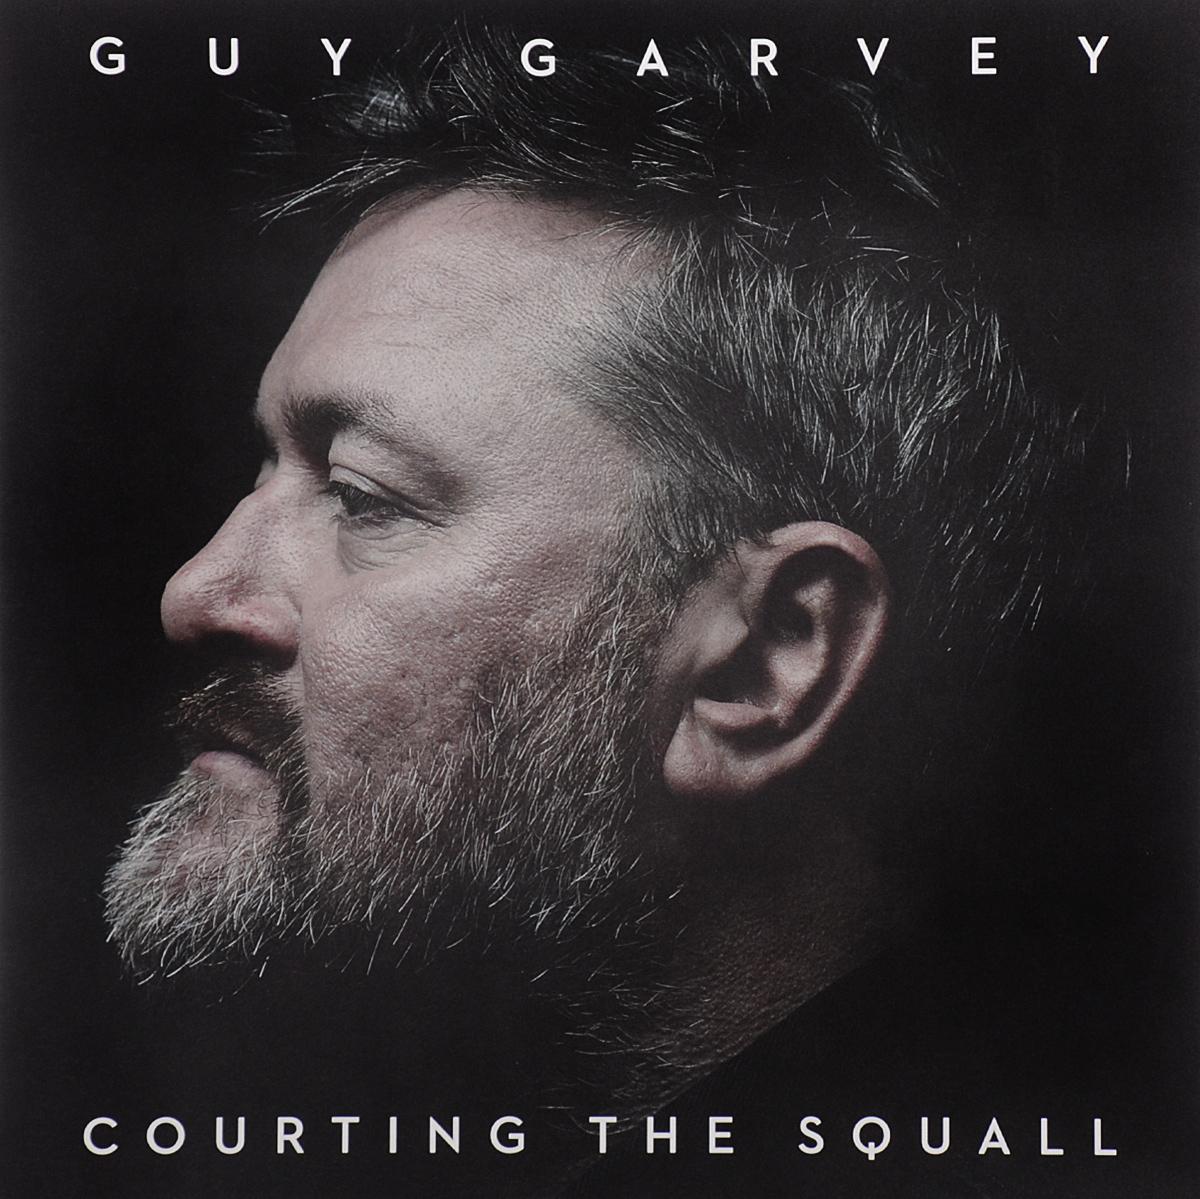 Гай Гэрви Guy Garvey. Courting The Squall (LP) carol steward courting katarina